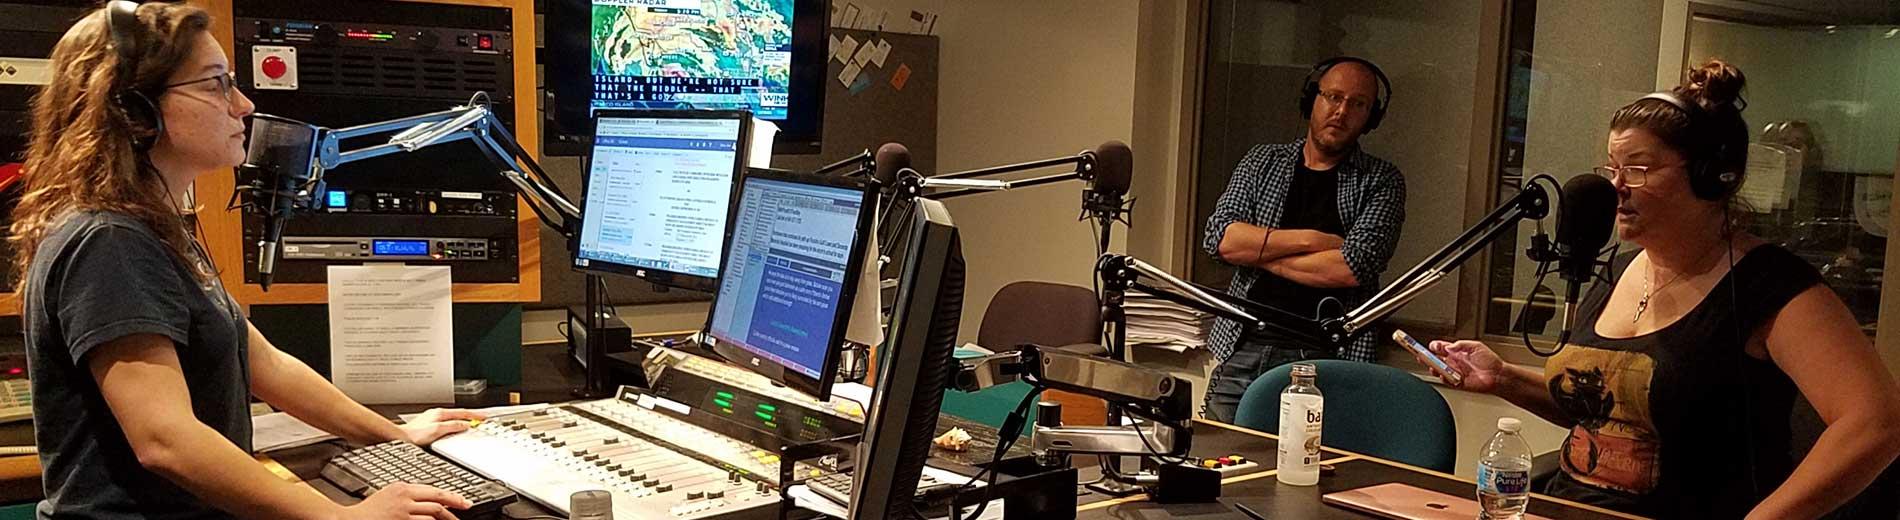 Photo shows WGCU-FM studio